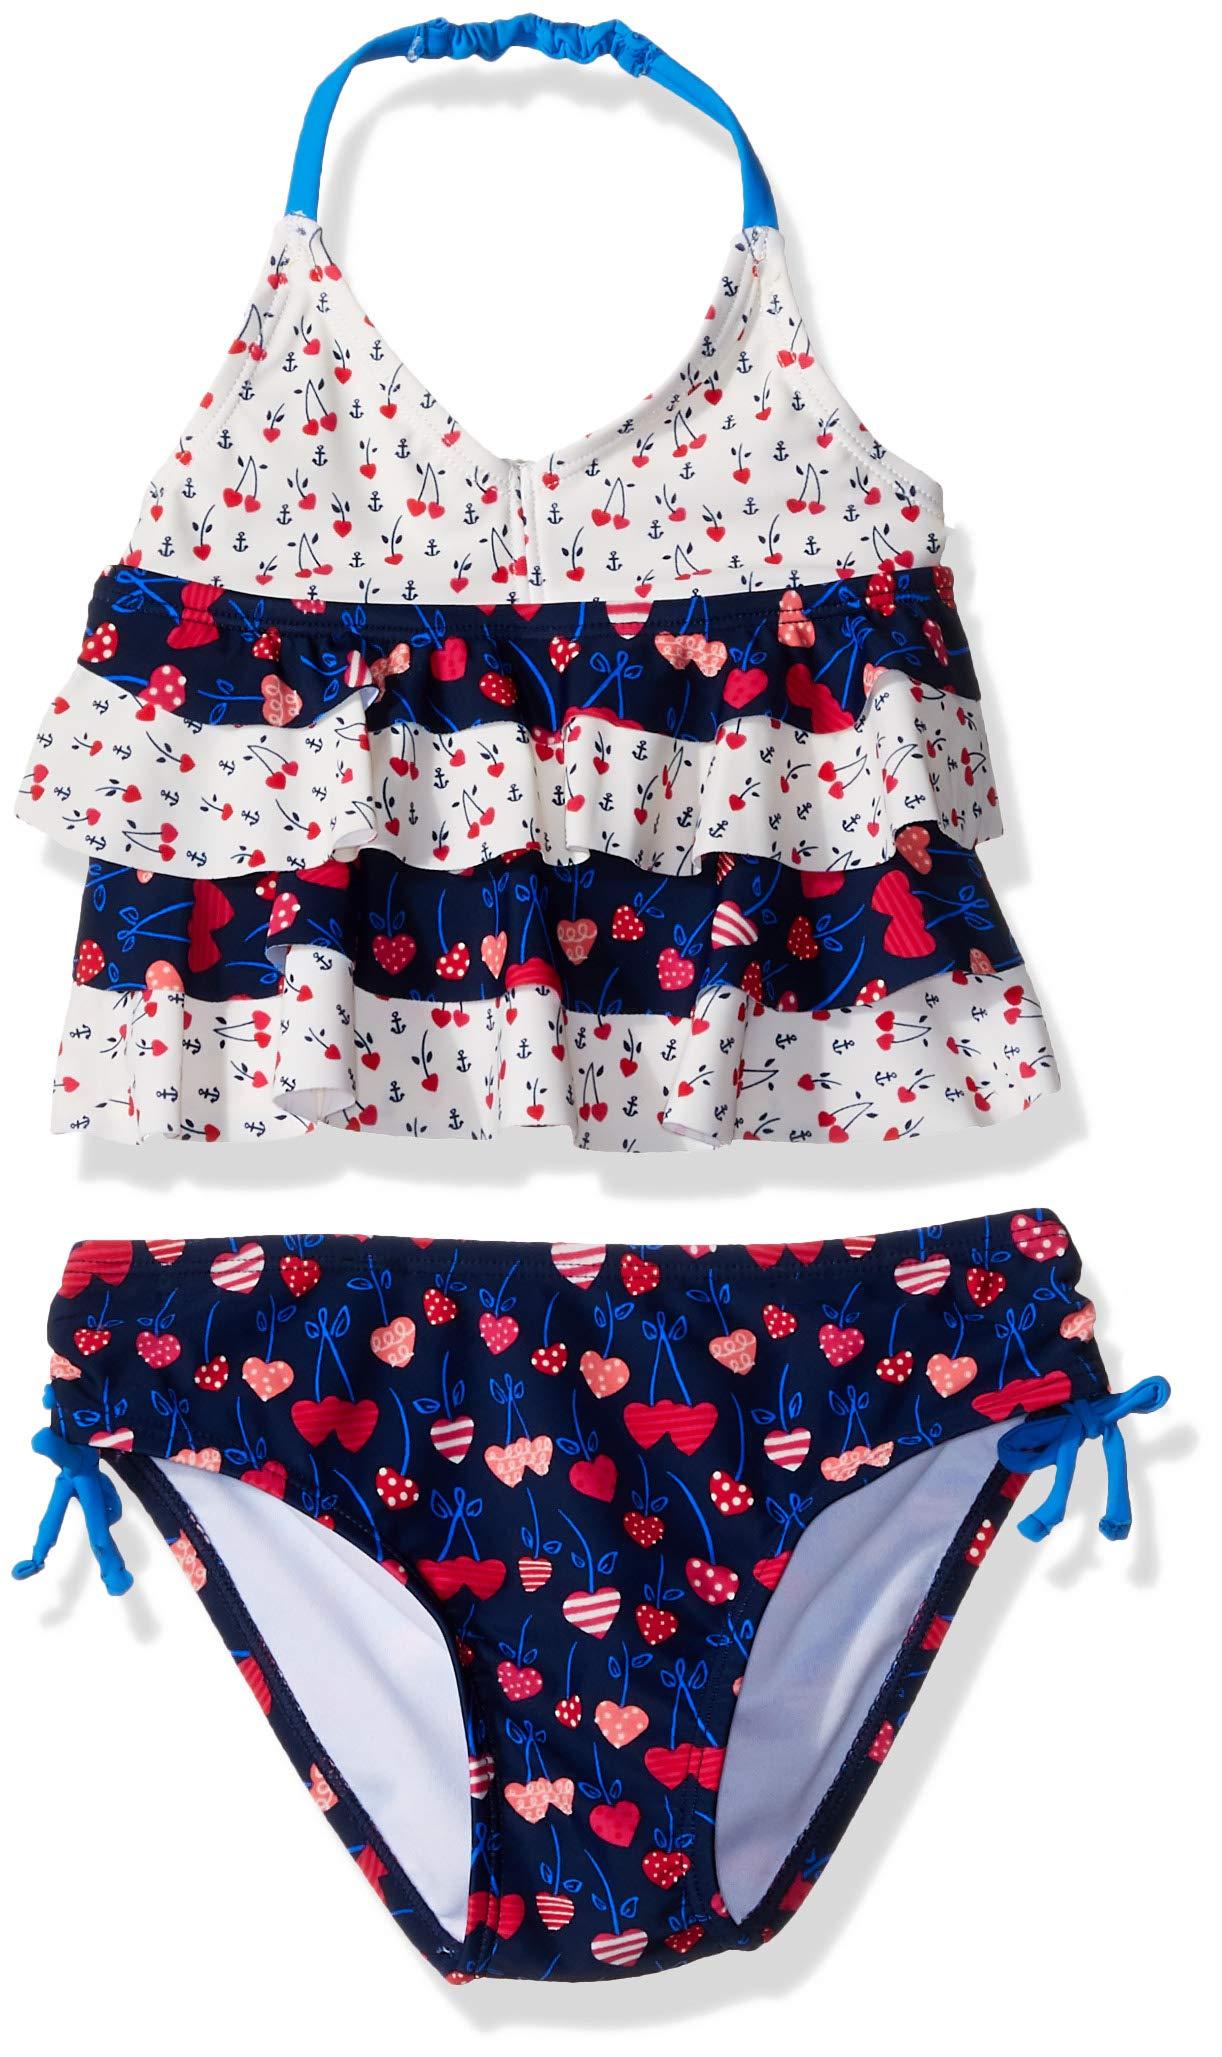 KIKO & MAX Girls' Ruffle Top Bikini Swimsuit Bathingsuit